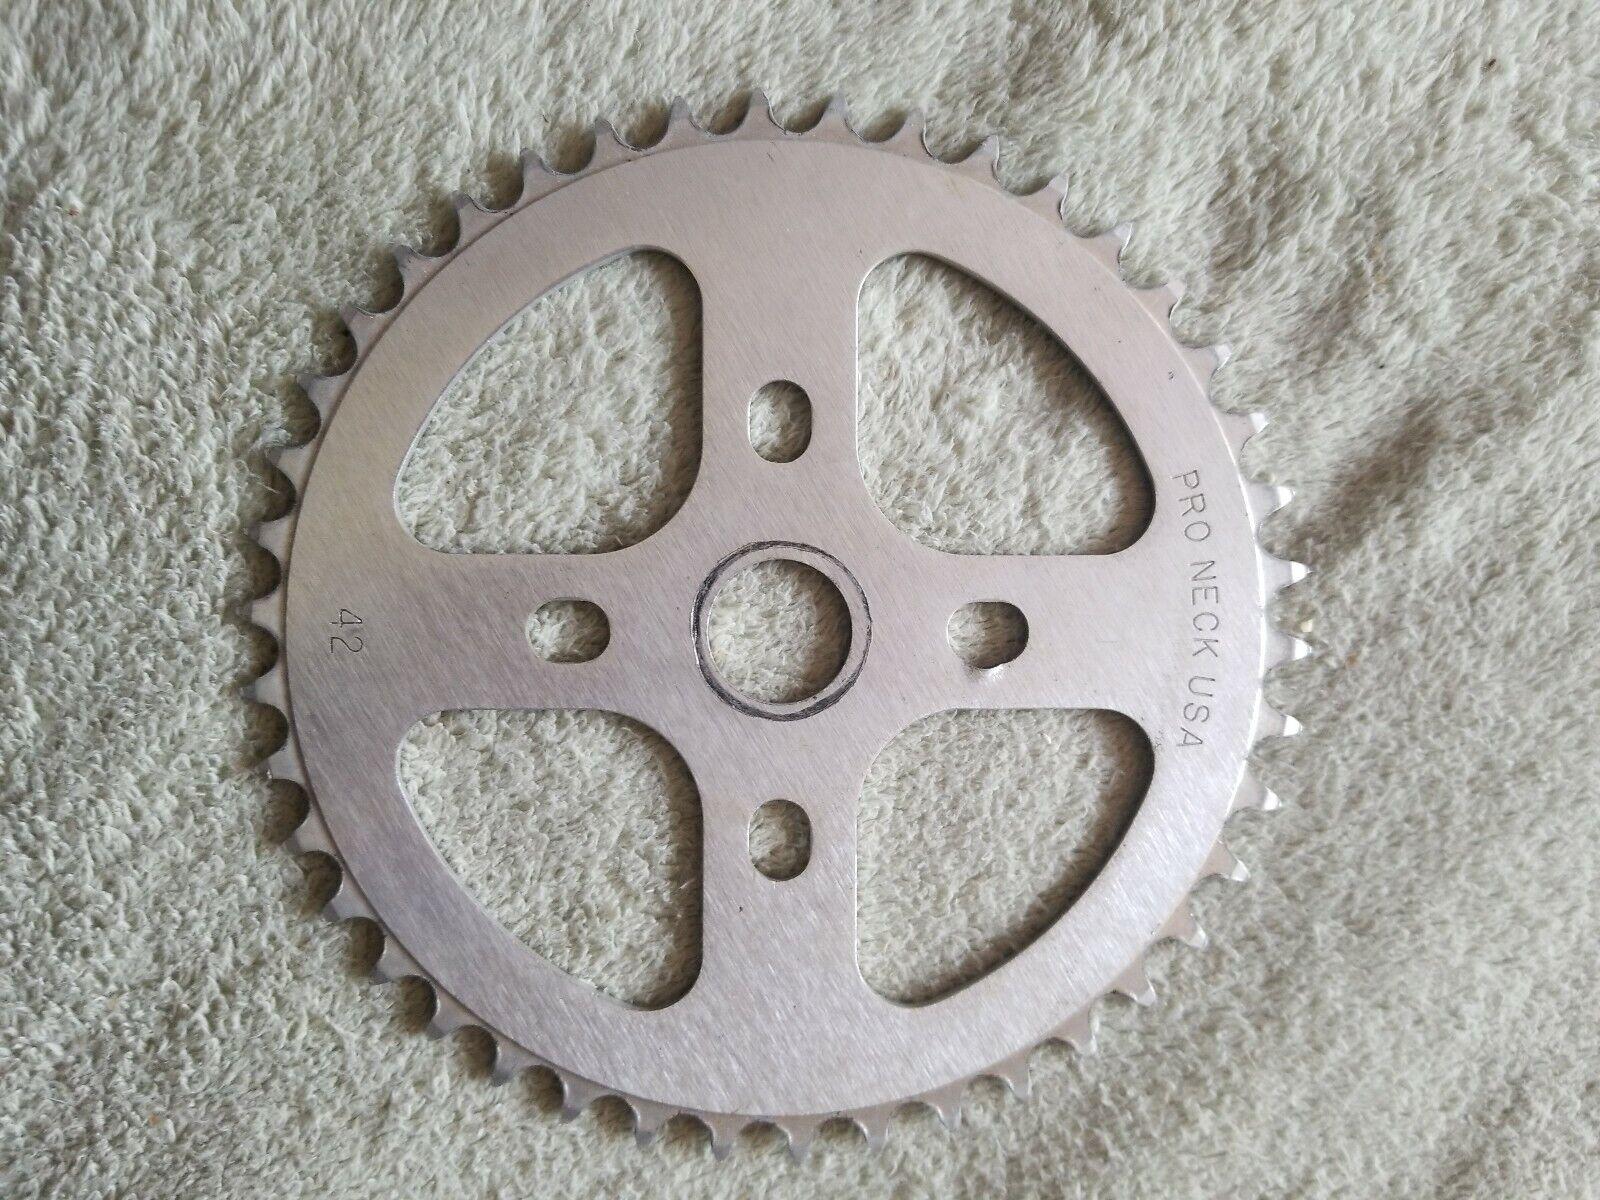 BMX bike SPROCKET Pro Neck USA 42t Silber chainring Fits gt haro hutch profile